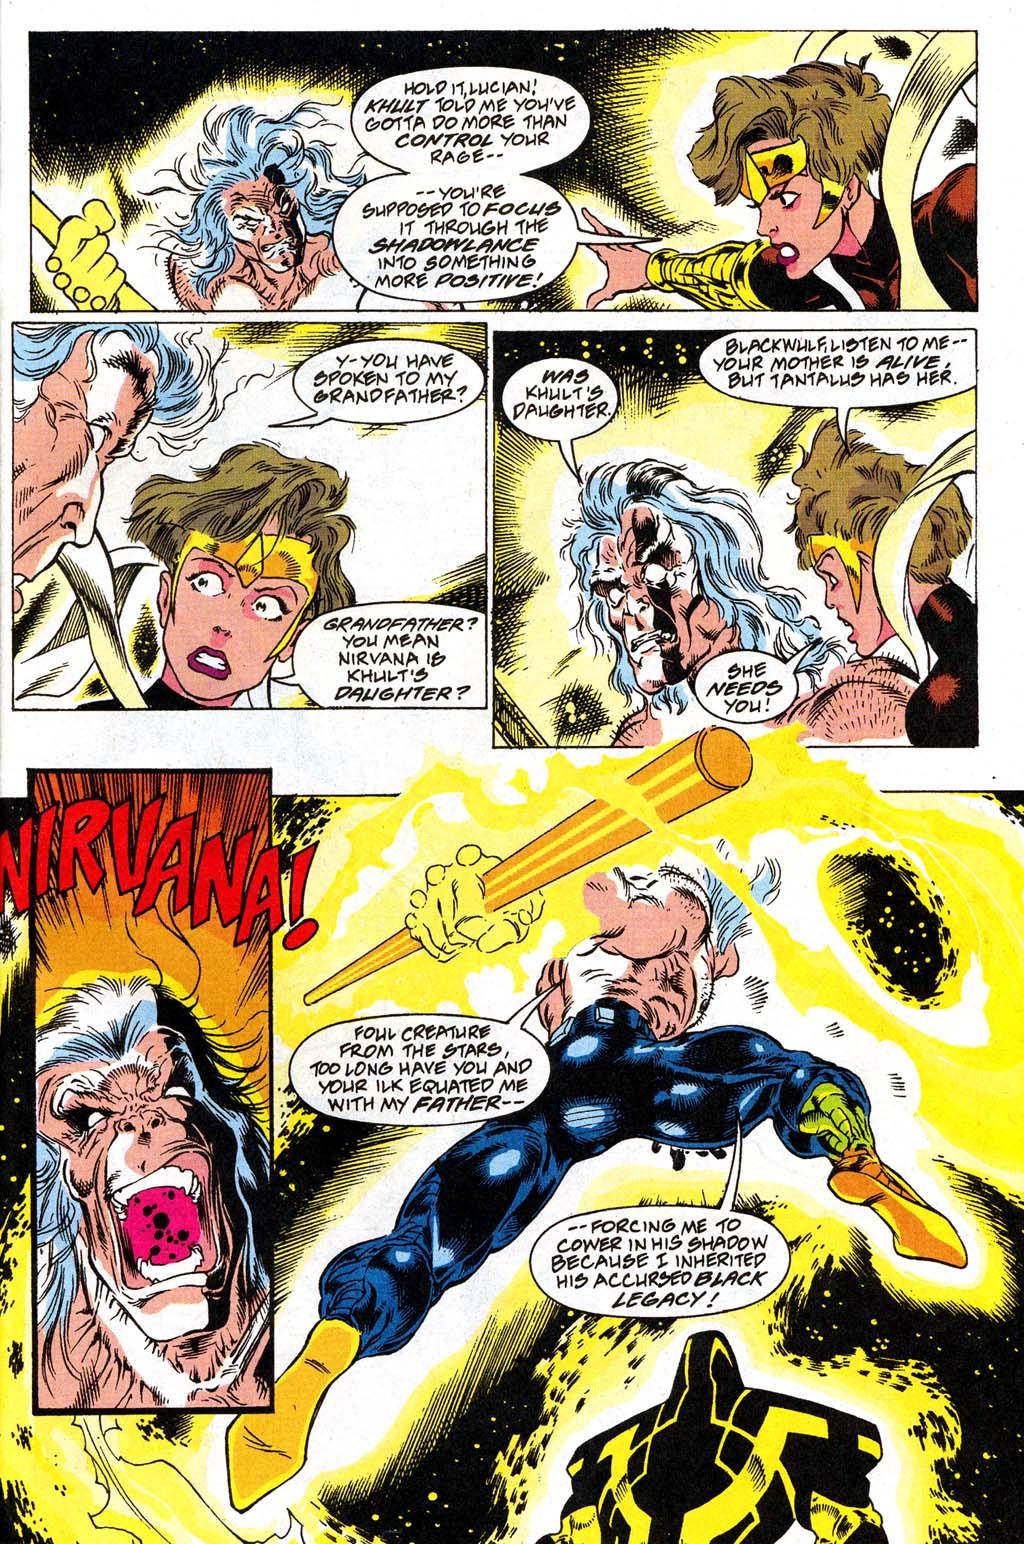 Read online Blackwulf comic -  Issue #9 - 19